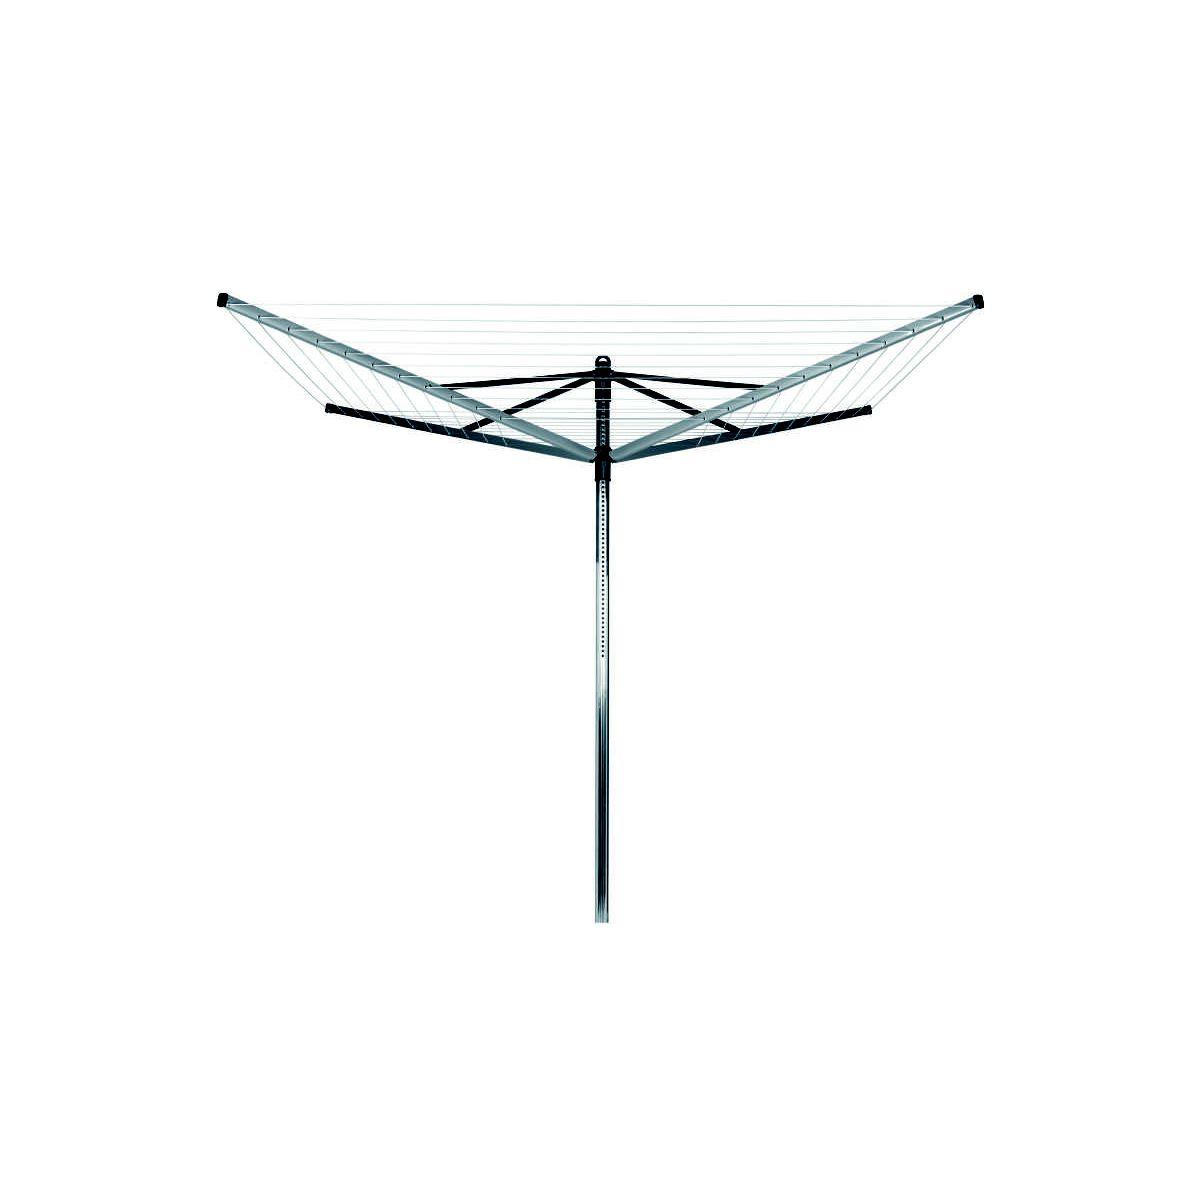 brabantia 311000 s choir linge parapluie comparer. Black Bedroom Furniture Sets. Home Design Ideas